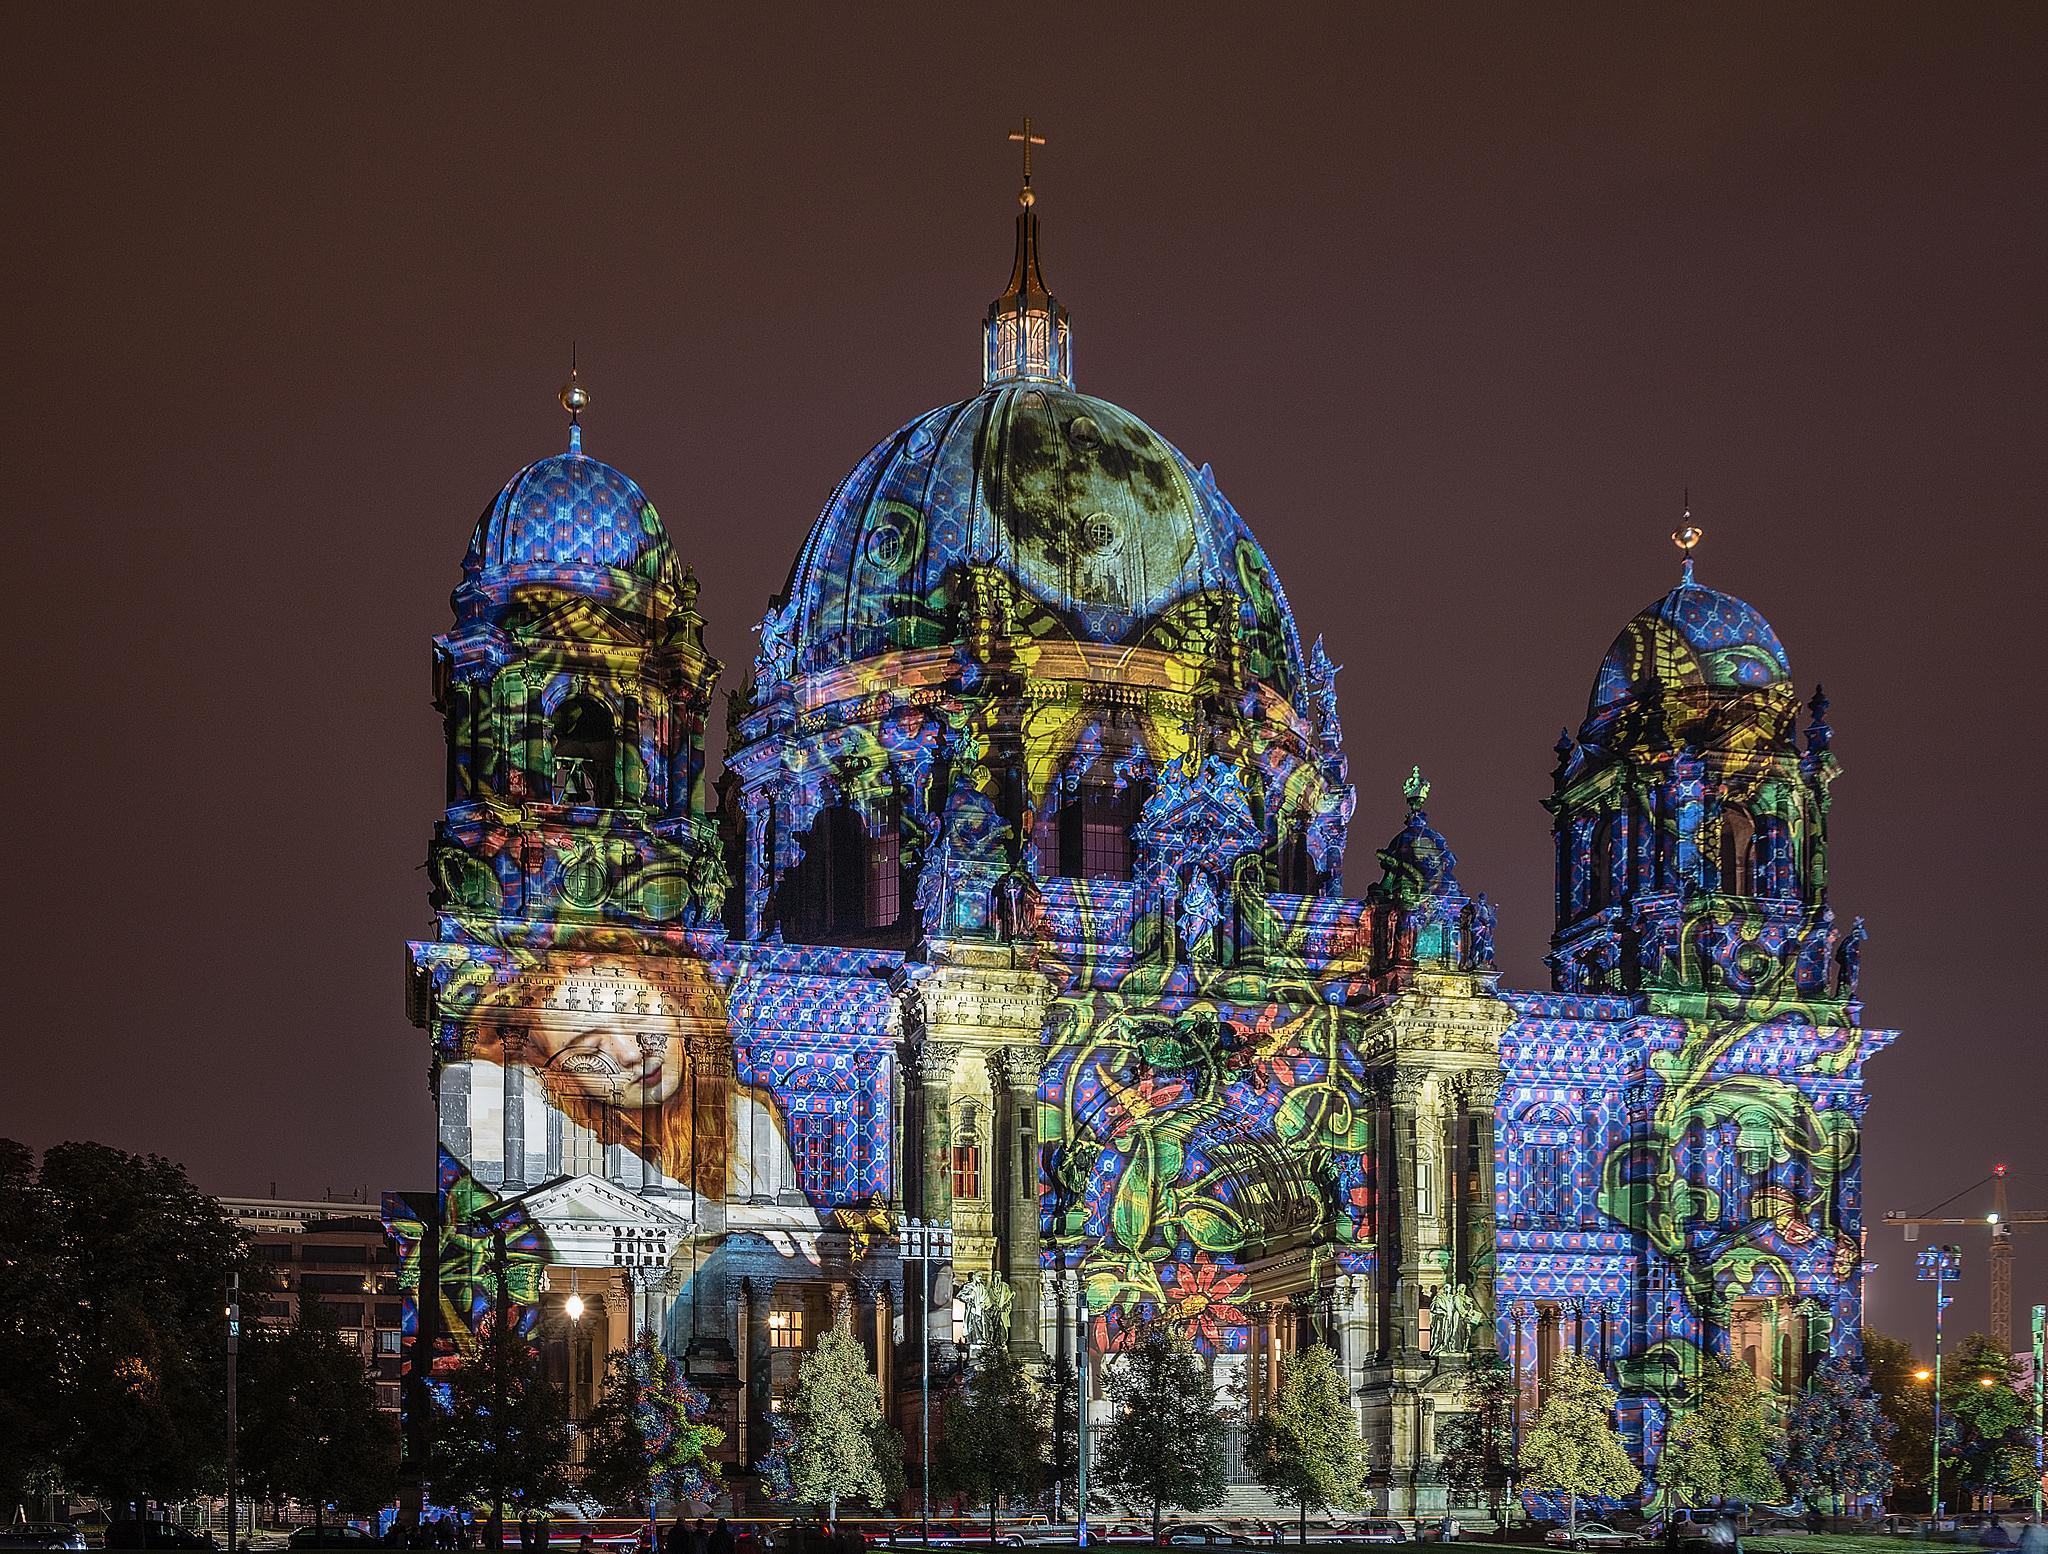 Berliner Dom - Fol 11 by Frank Haase